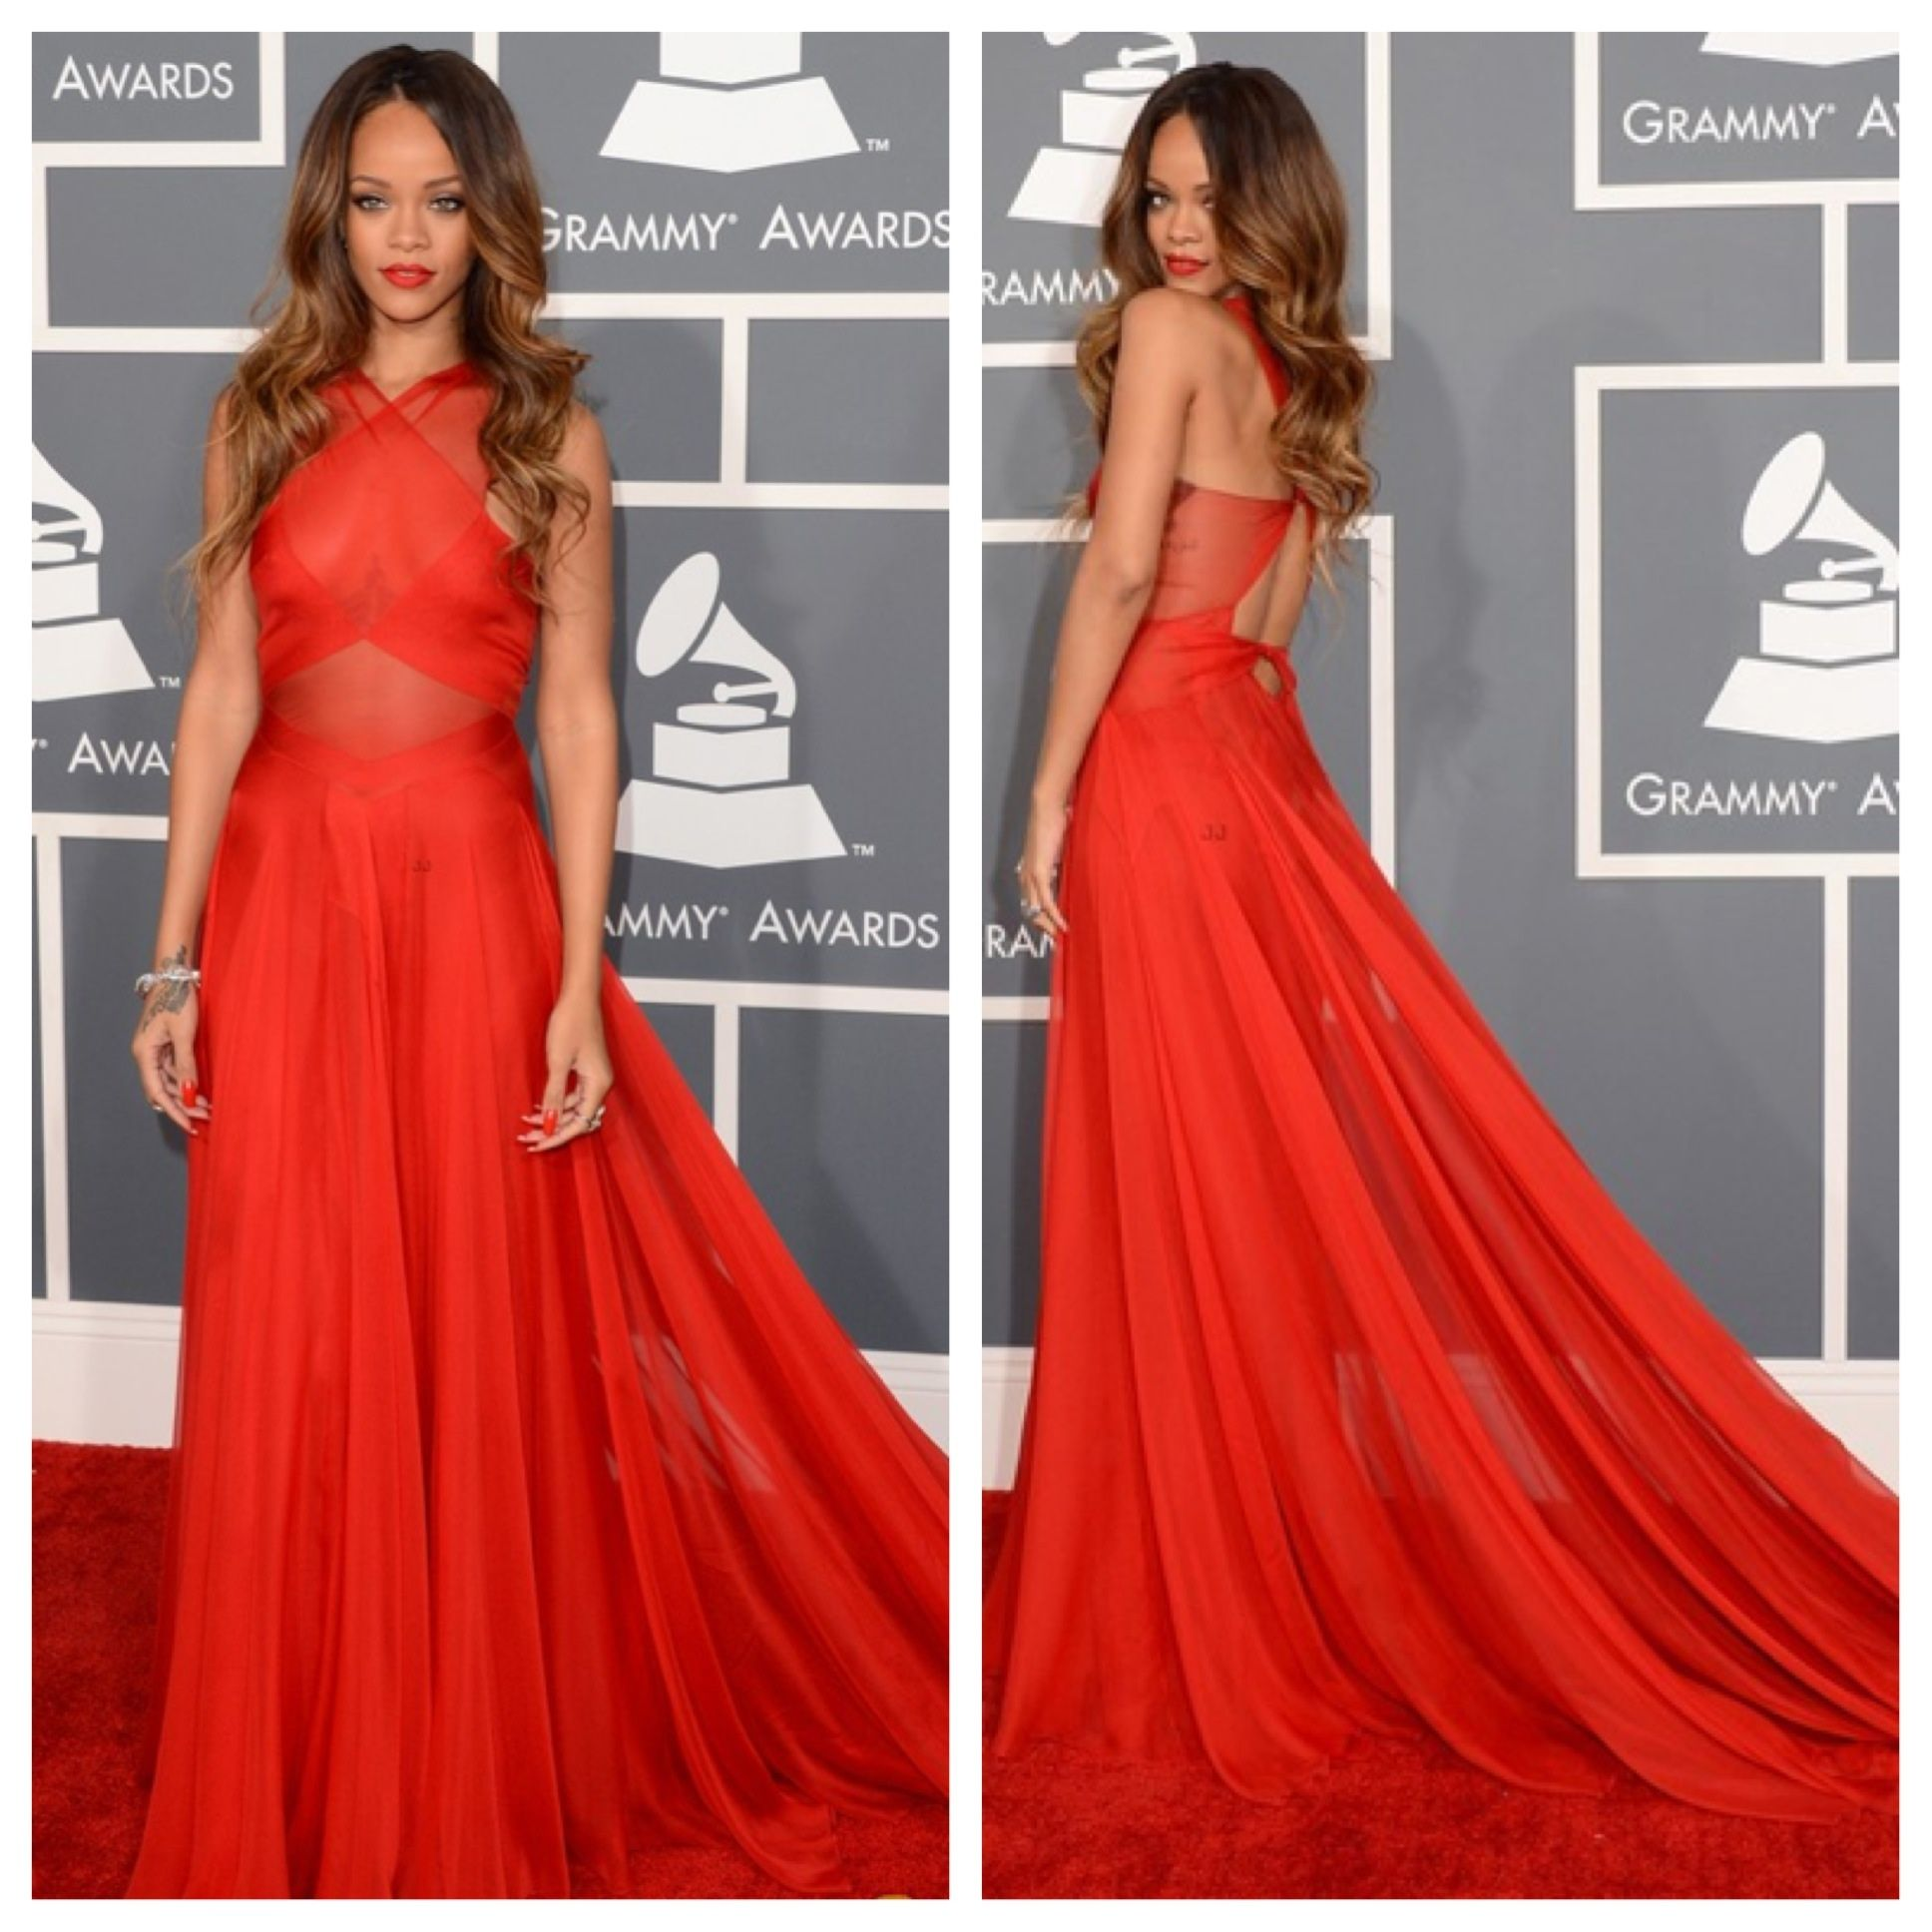 Stunning! | Red prom dress, Rihanna red carpet dresses ...